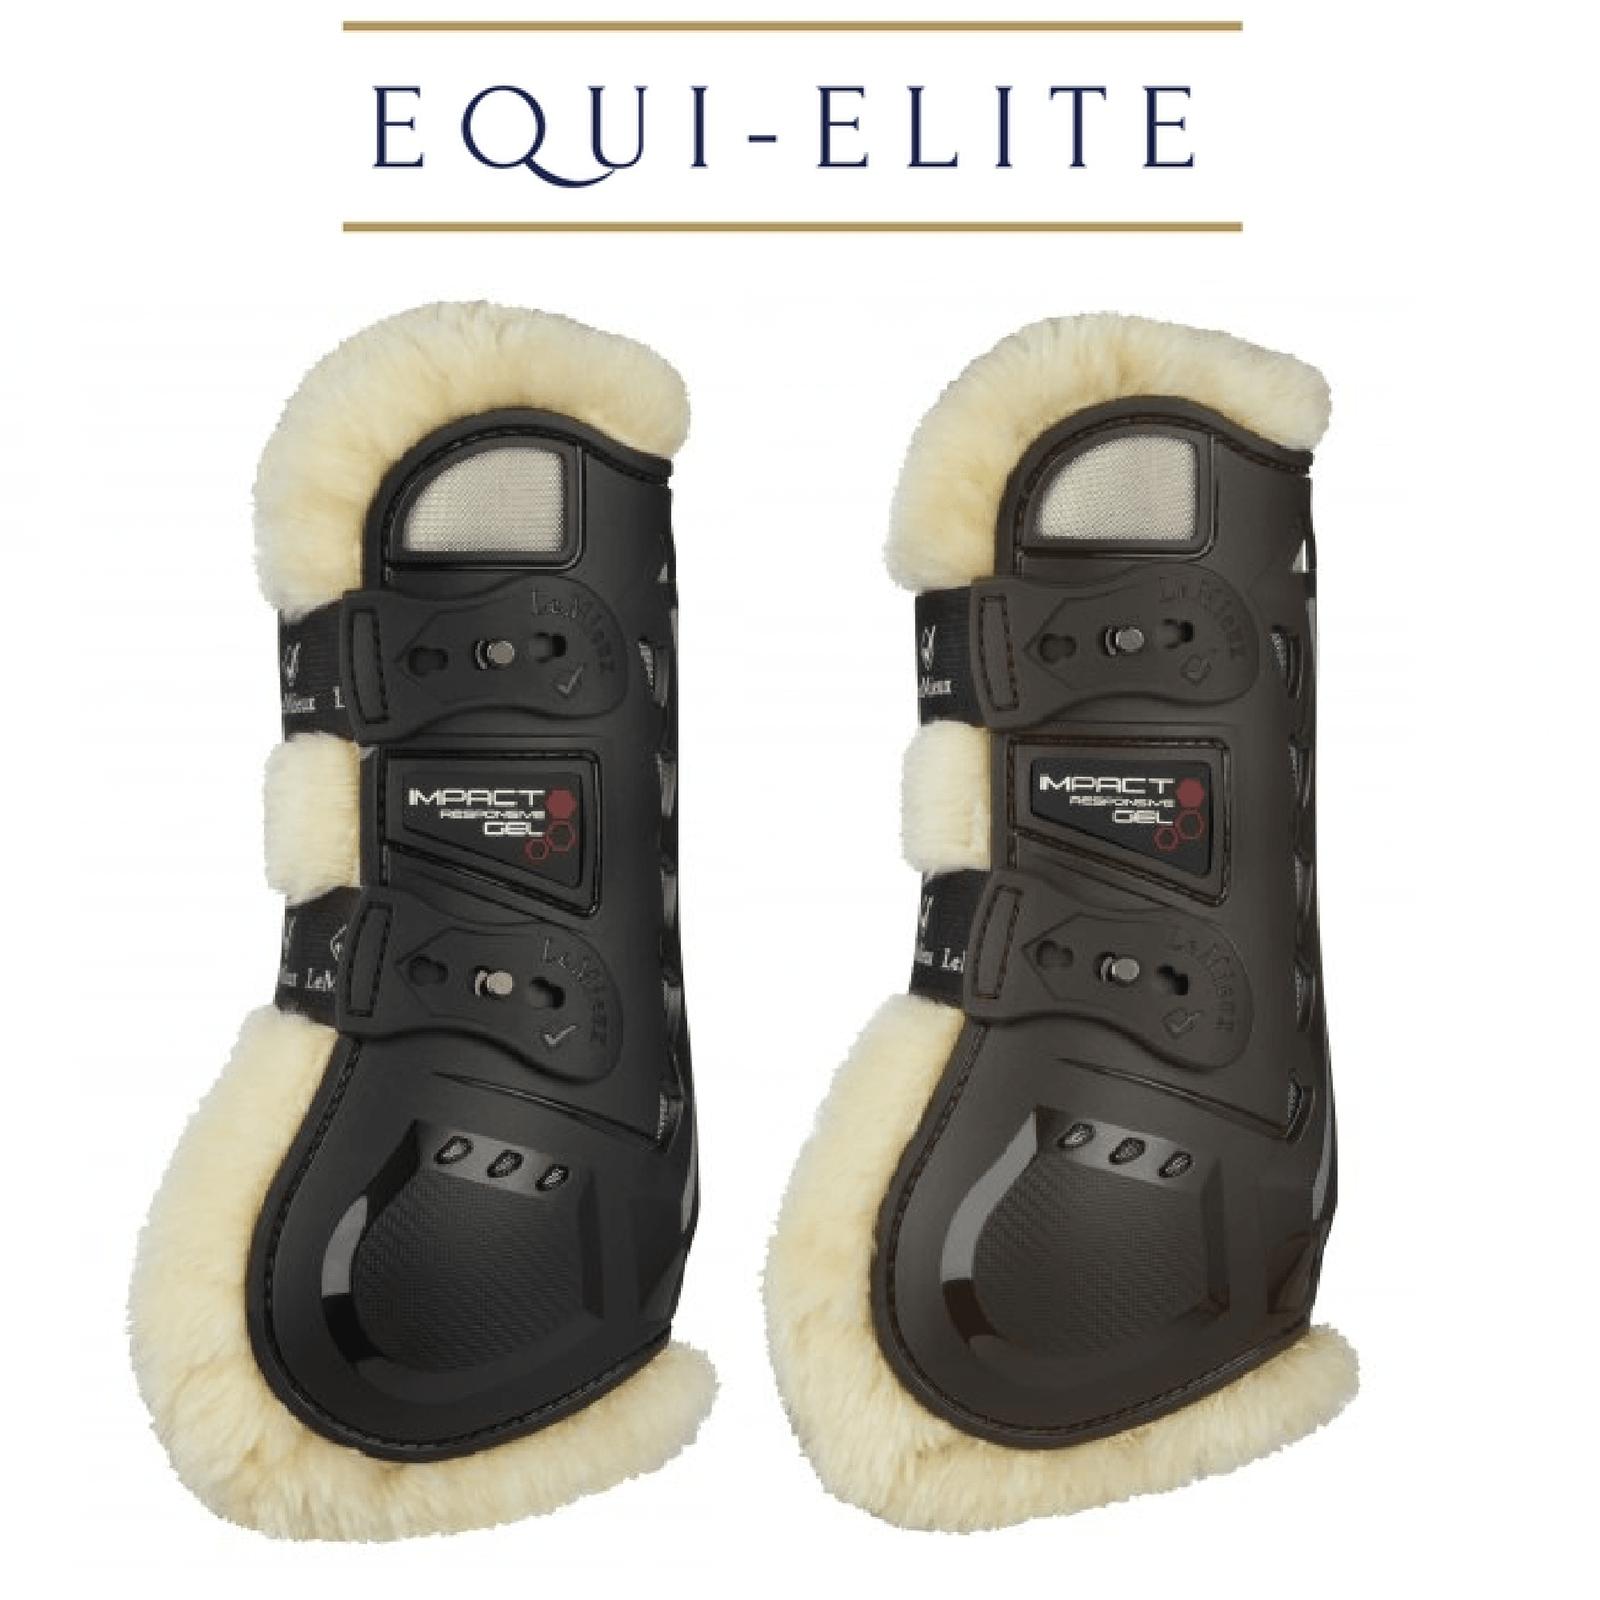 Lemieux Comfort impatto reattivo GEL Tendini Stivali Salto Ostacoli